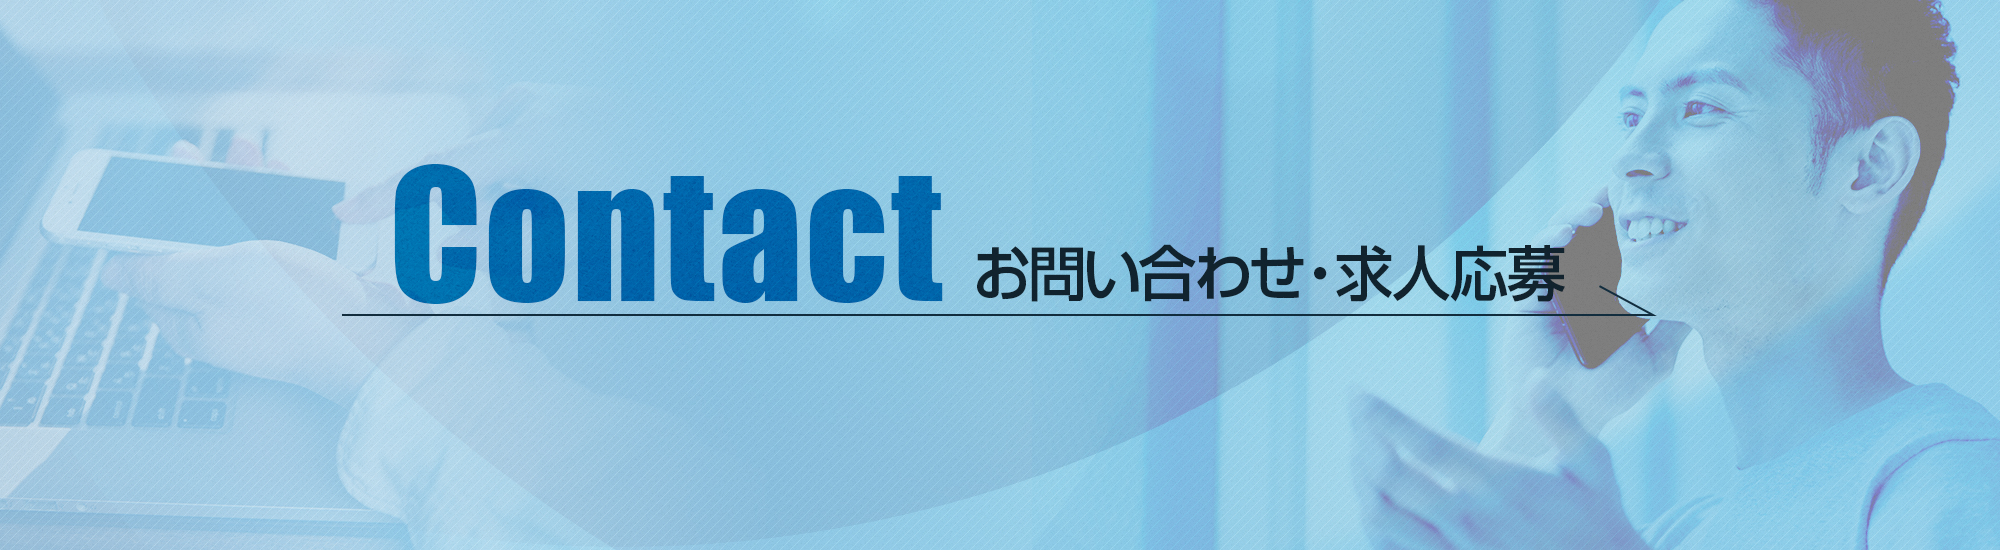 banner_big_contact